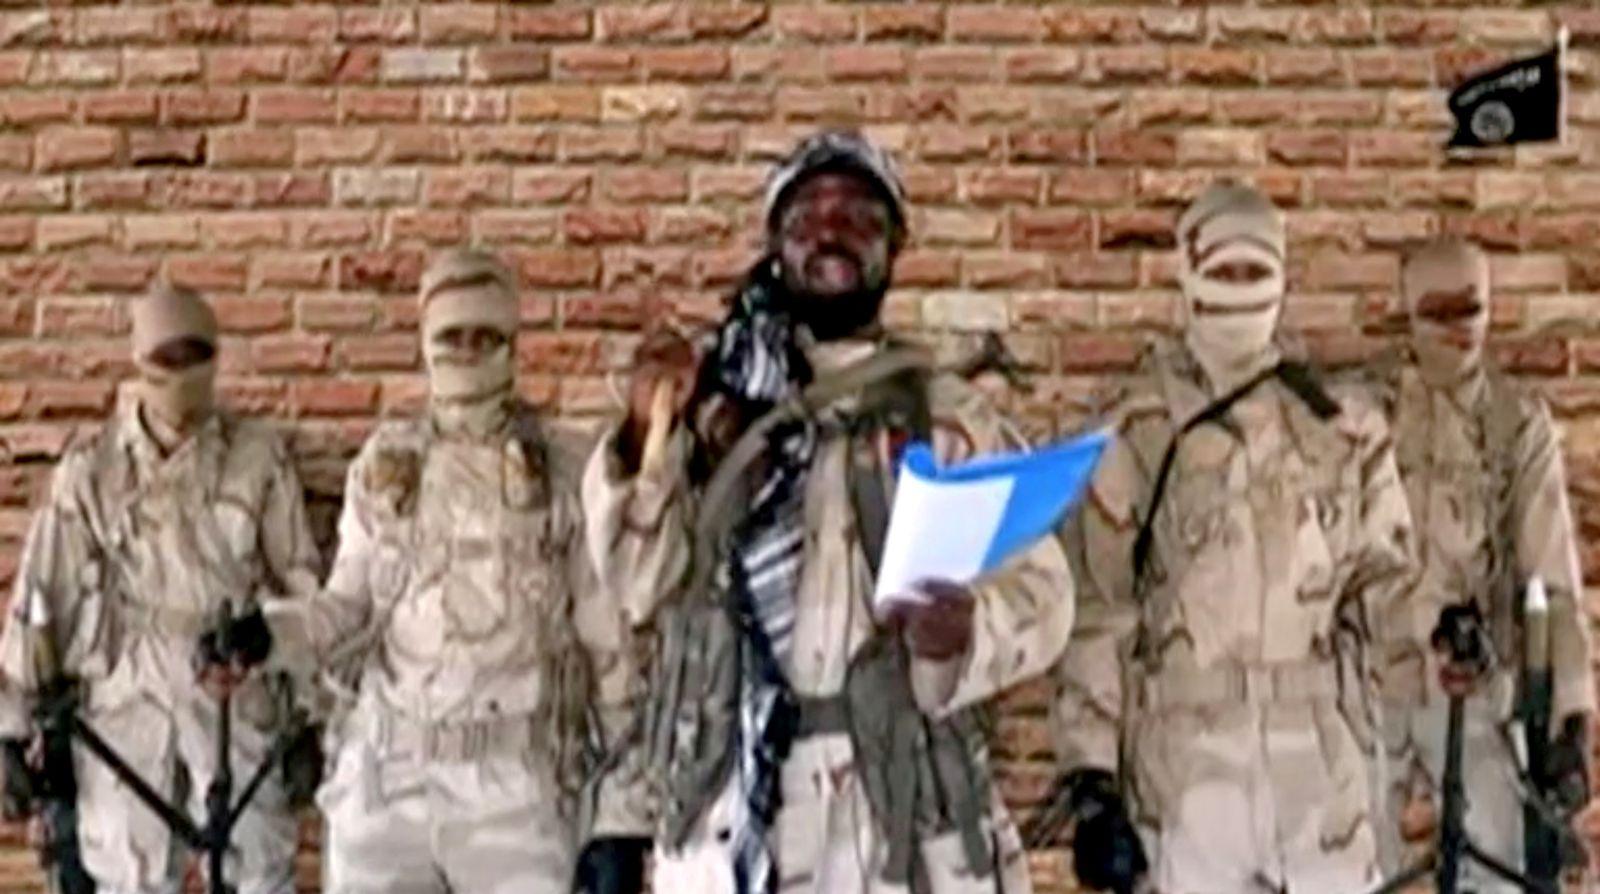 FILE PHOTO: Boko Haram leader Abubakar Shekau speaks in front of guards in an unknown location in Nigeria